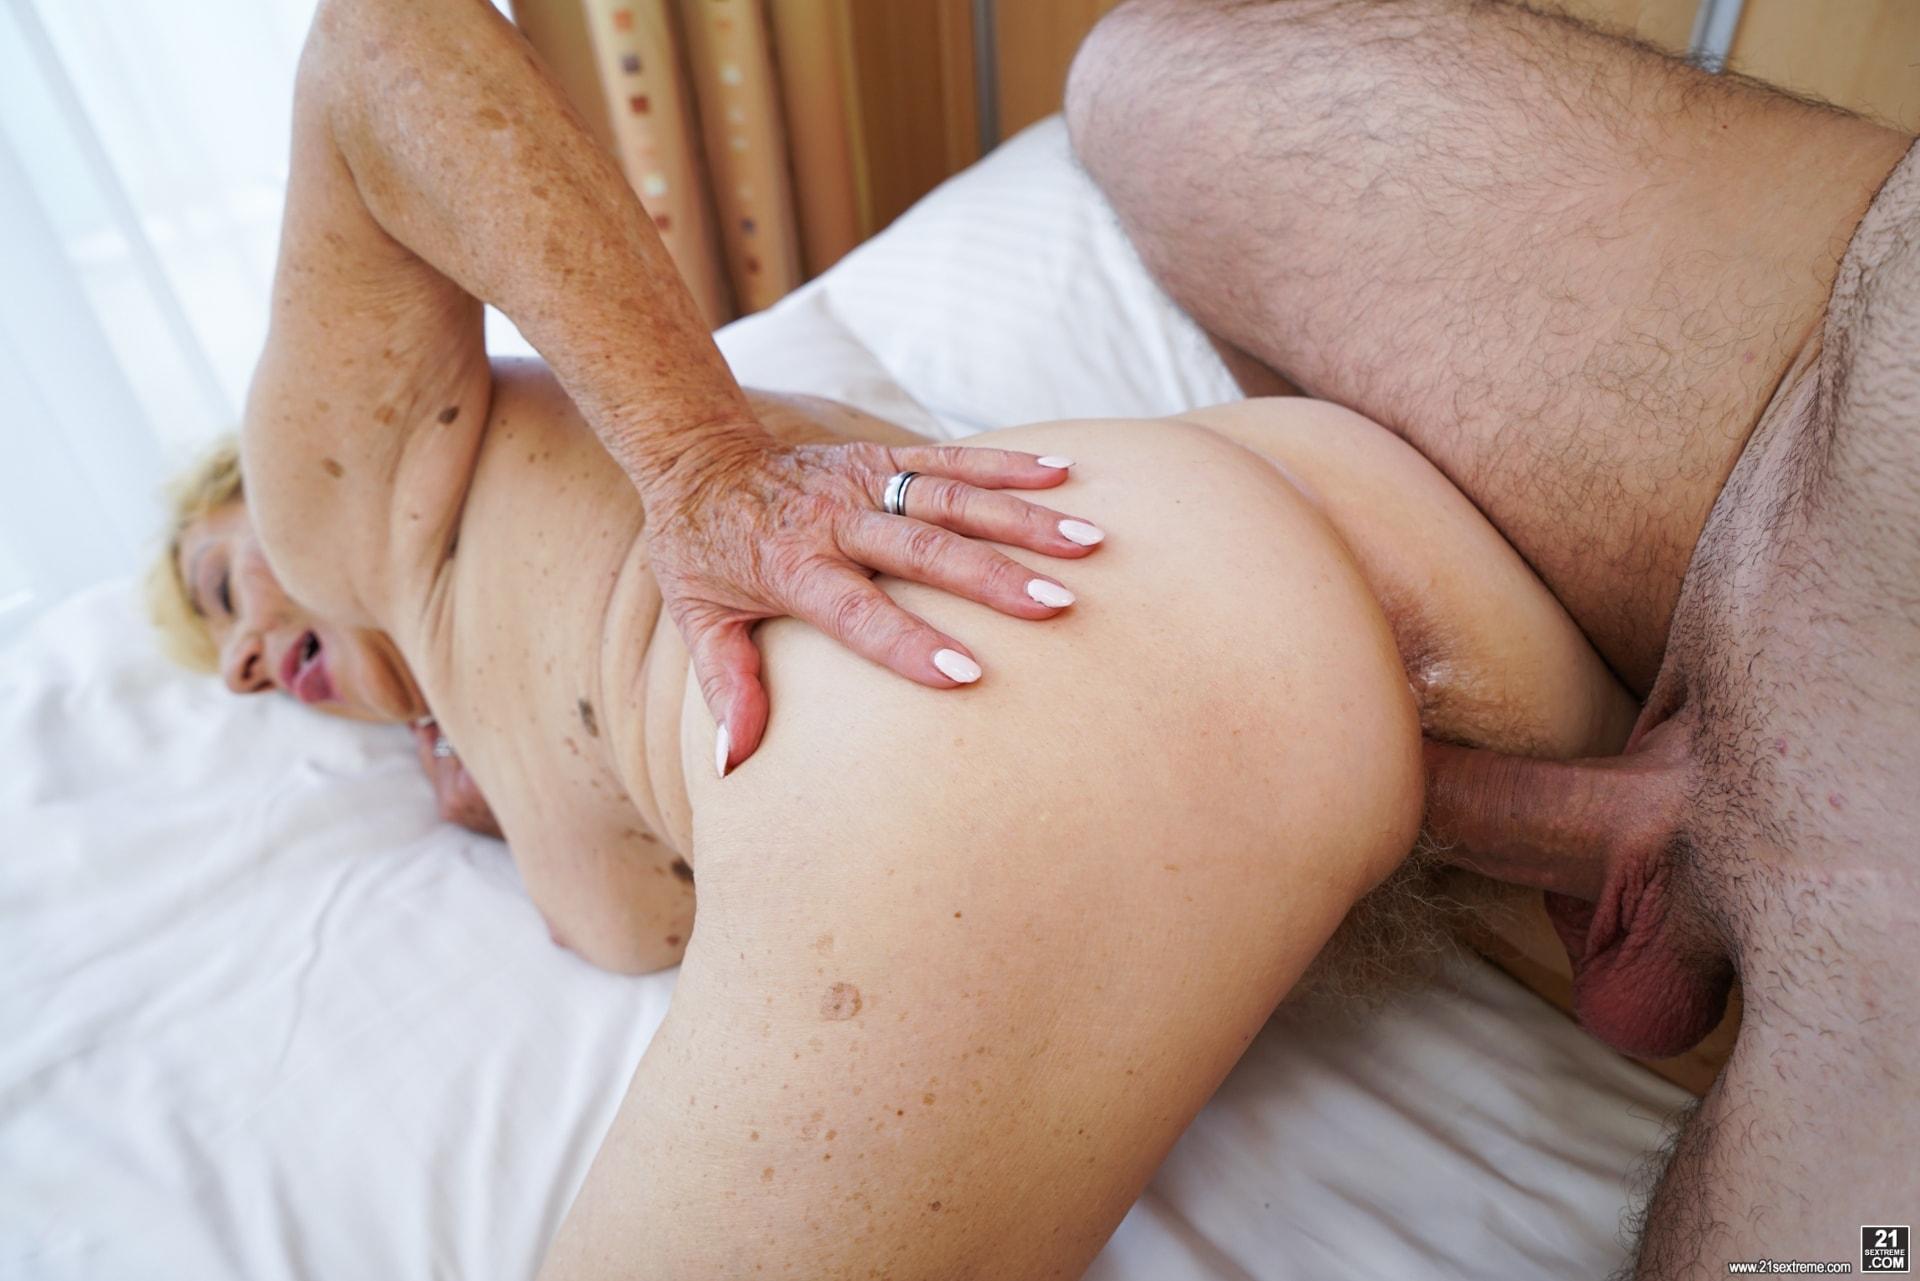 21Sextury 'Old Passion' starring Malya (Photo 125)